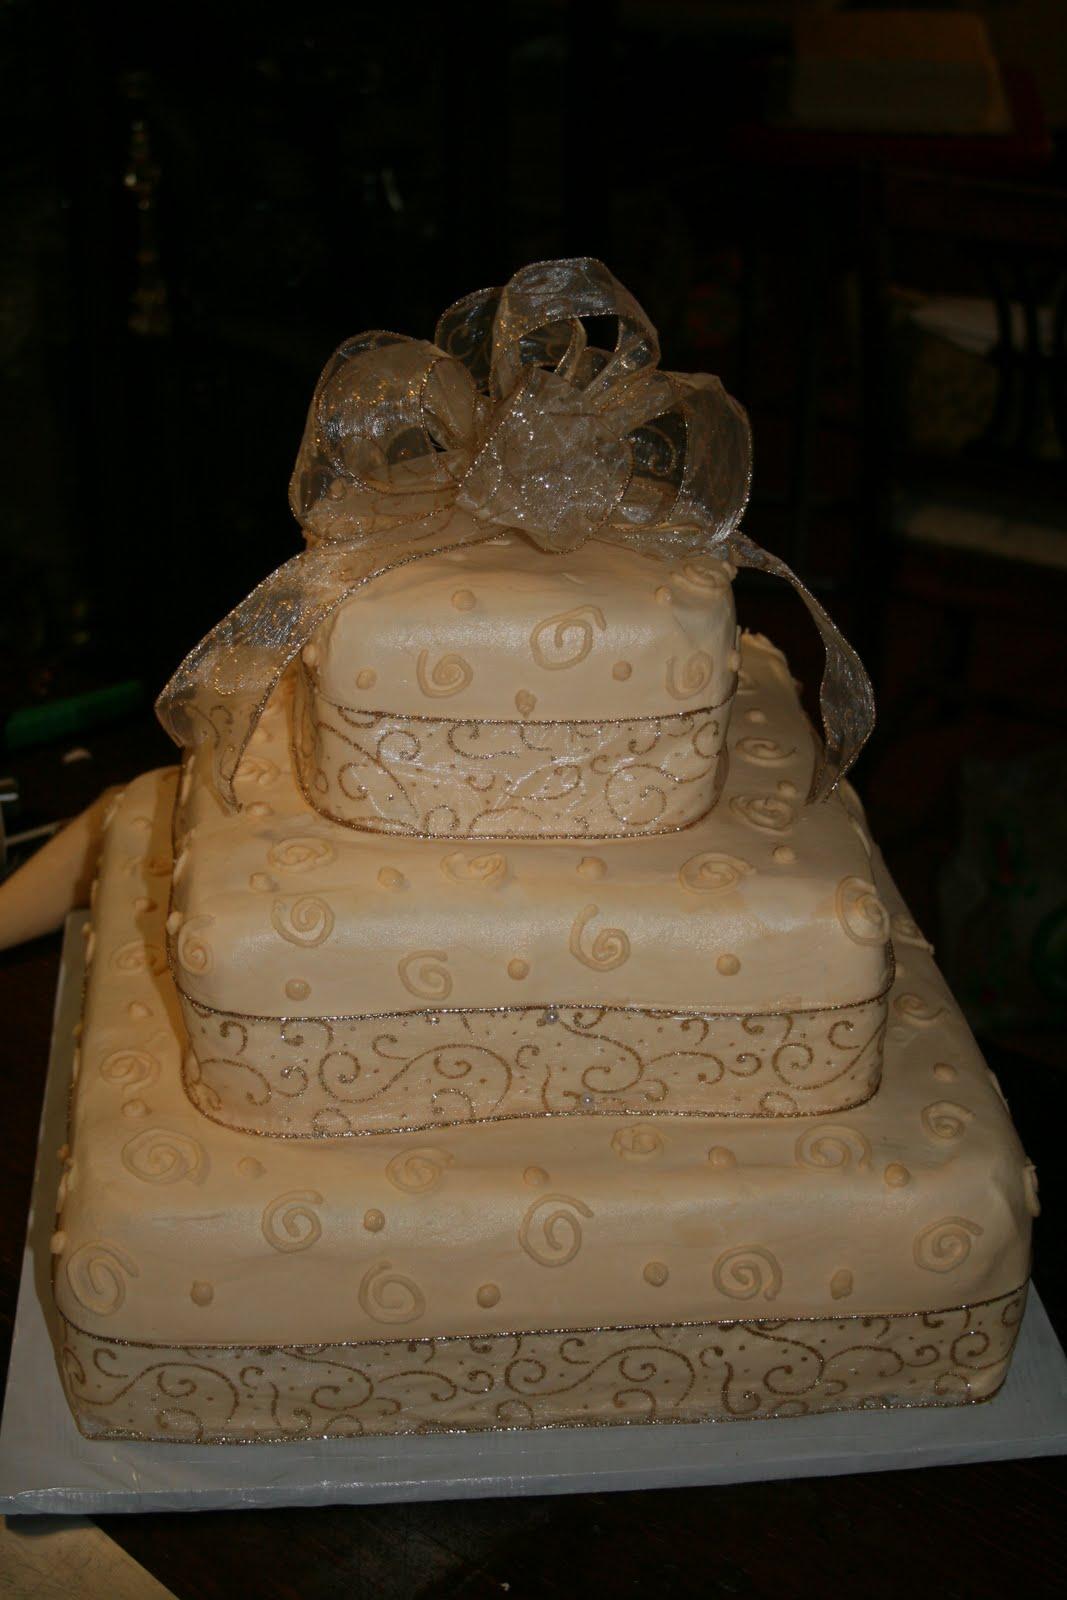 Bichelles blog sample 50th wedding